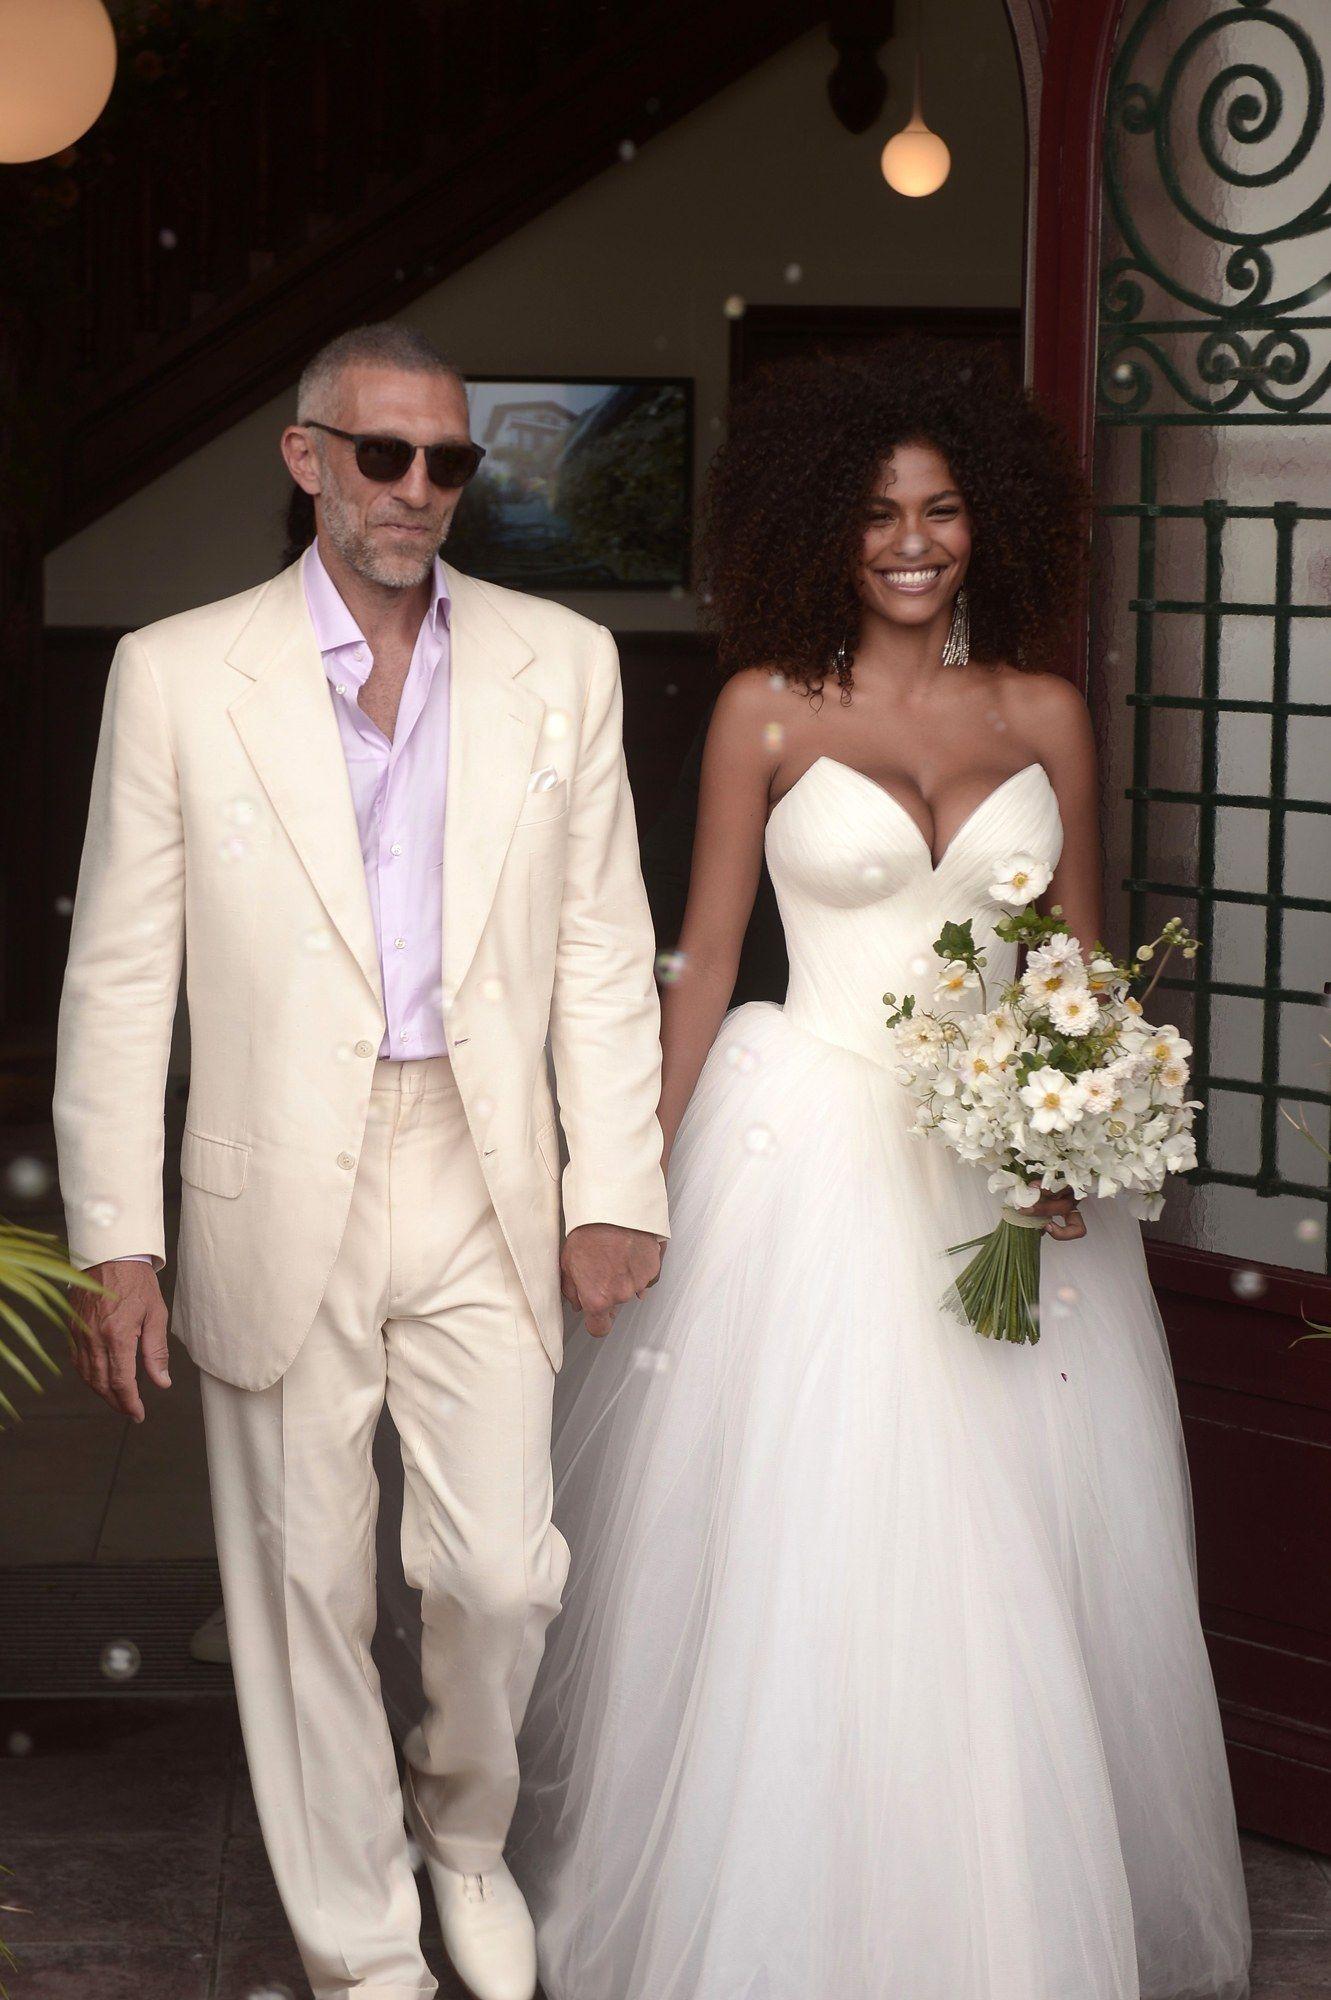 Varrer Princess White Wedding Dresses Sweet Heart Train drapeado Garden Country vestidos de noiva vetidos de novia Plus Size personalizado